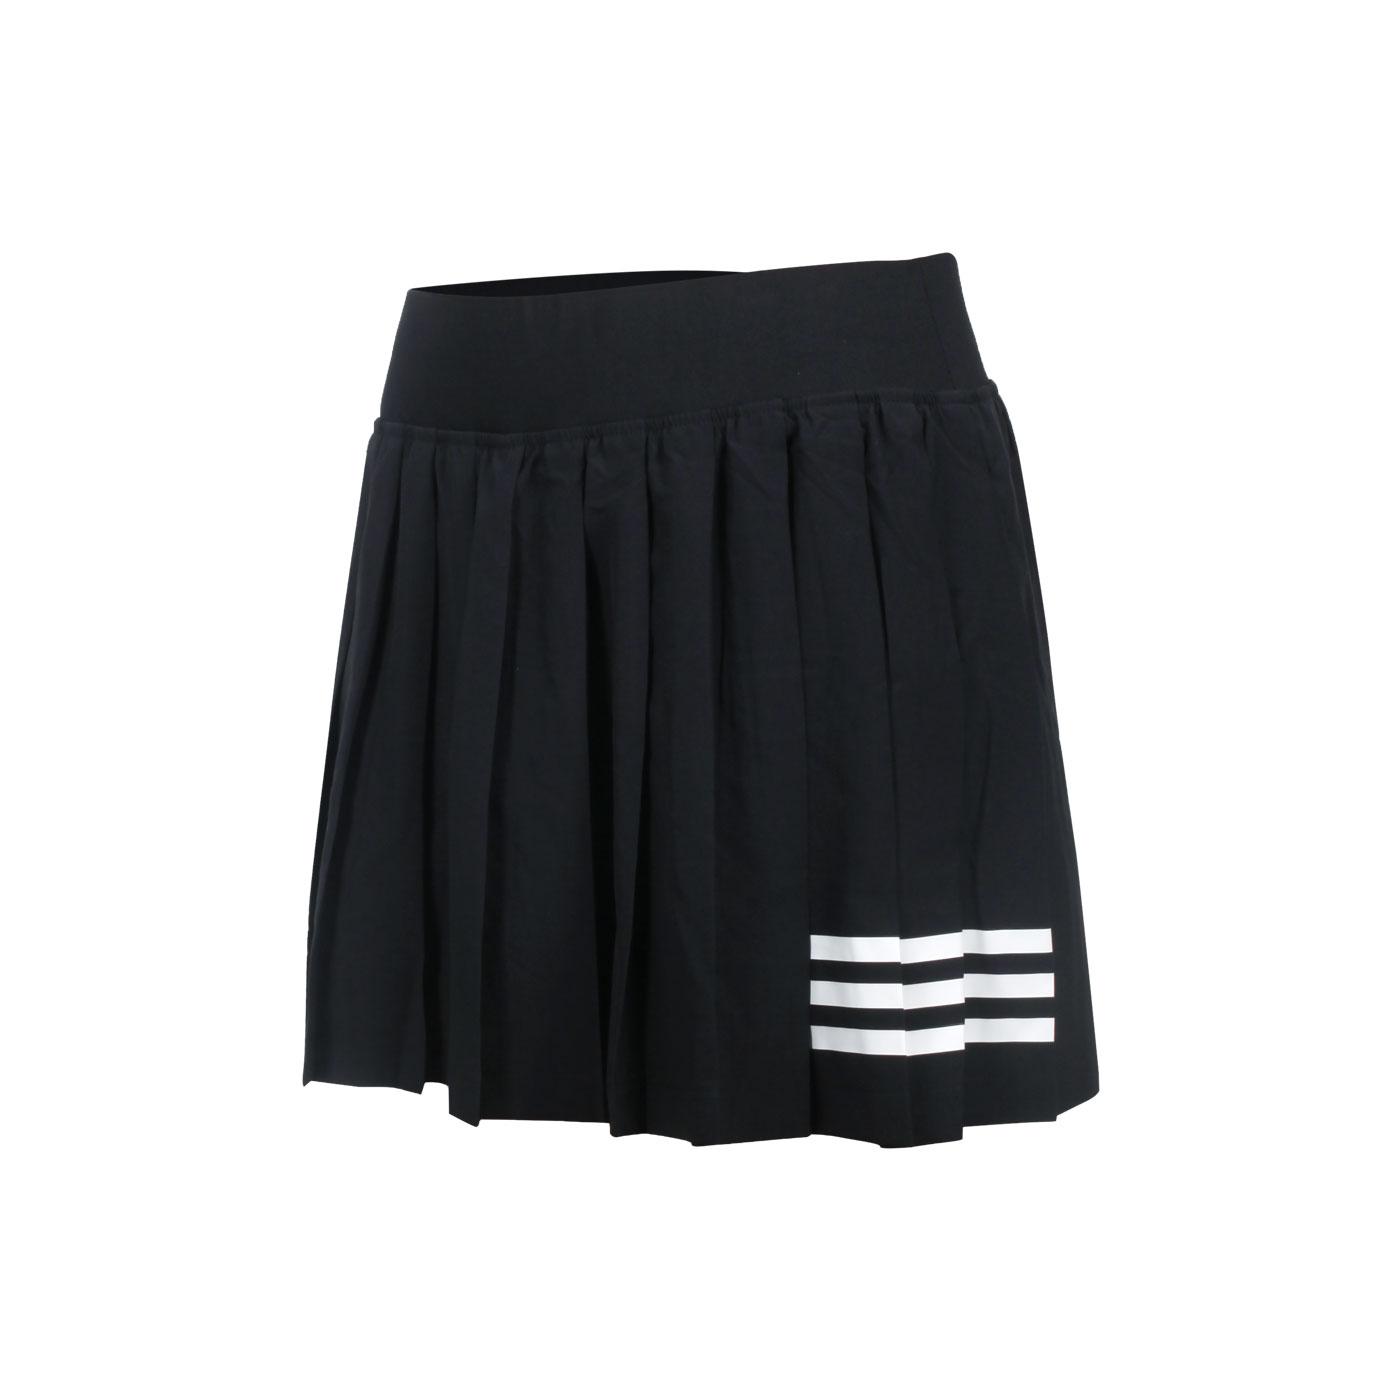 ADIDAS 女款短裙 GL5468